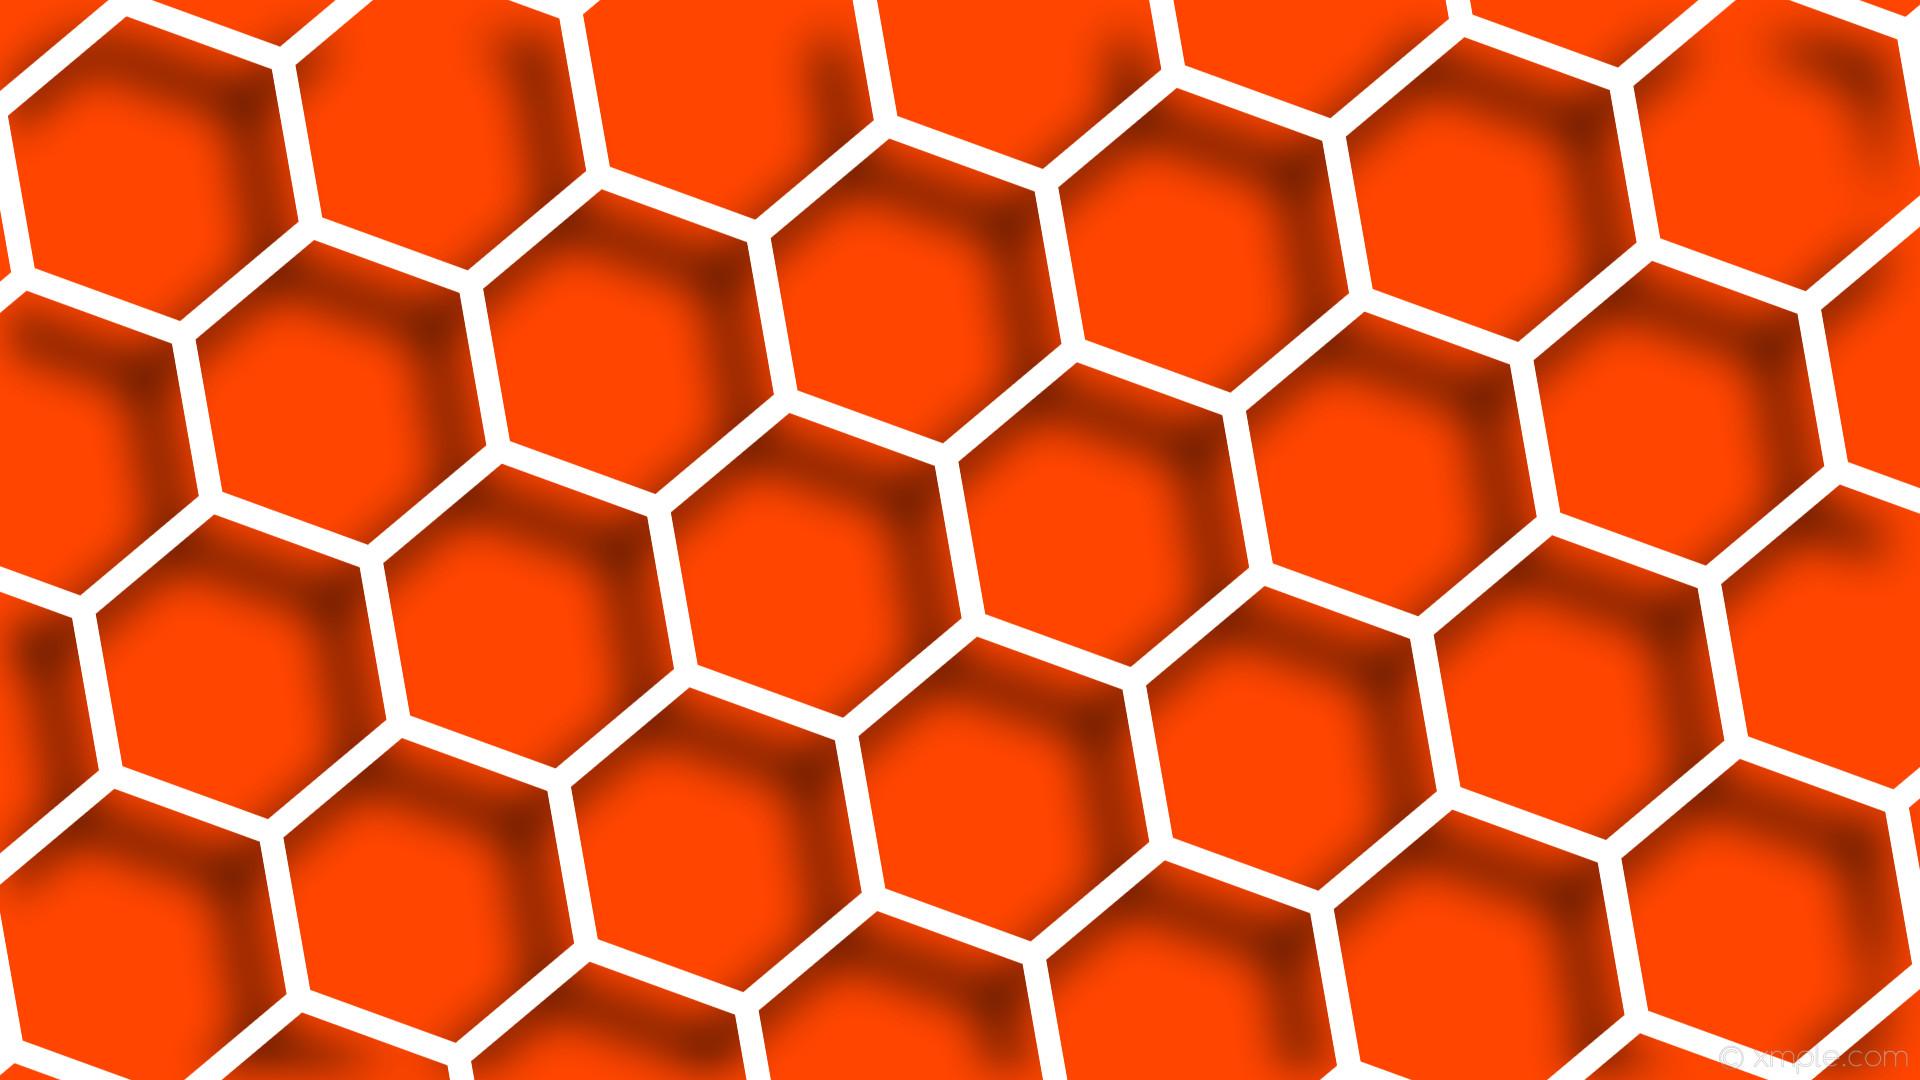 wallpaper white hexagon orange drop shadow beehive orangered #ffffff  #ff4500 40° 24px 292px